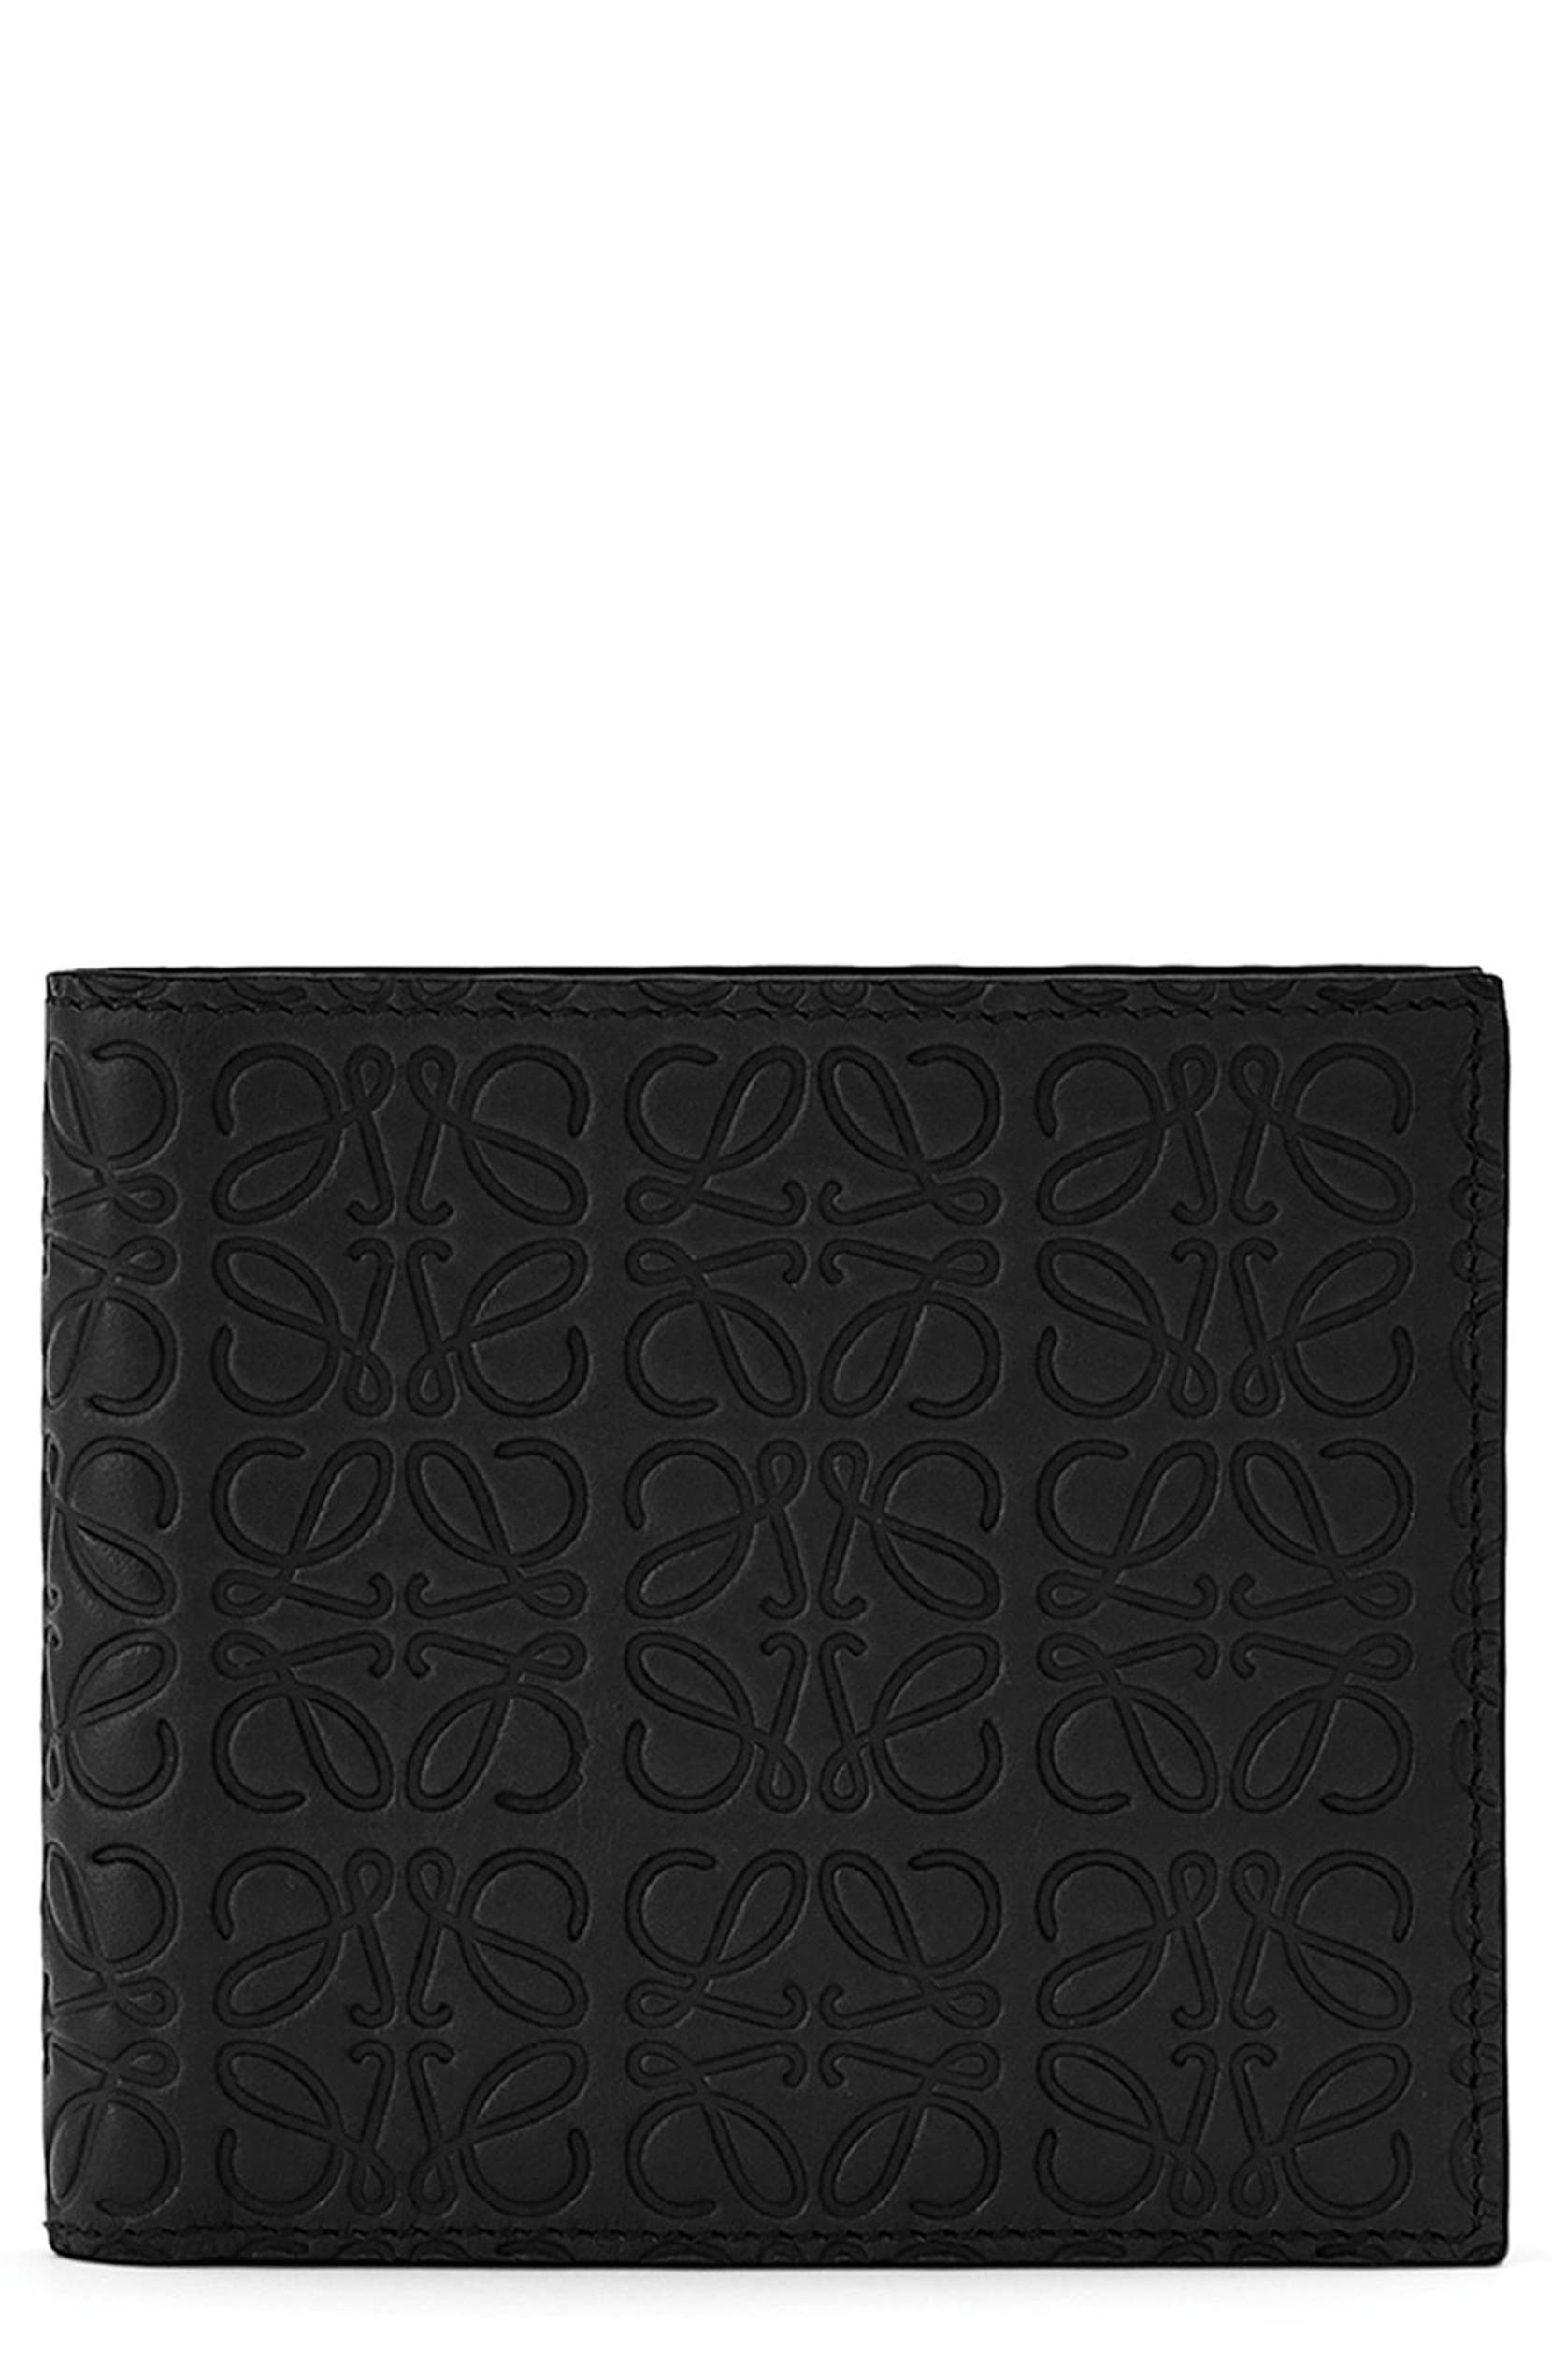 b32350c2e492 Loewe Logo Embossed Calfskin Leather Bifold Wallet